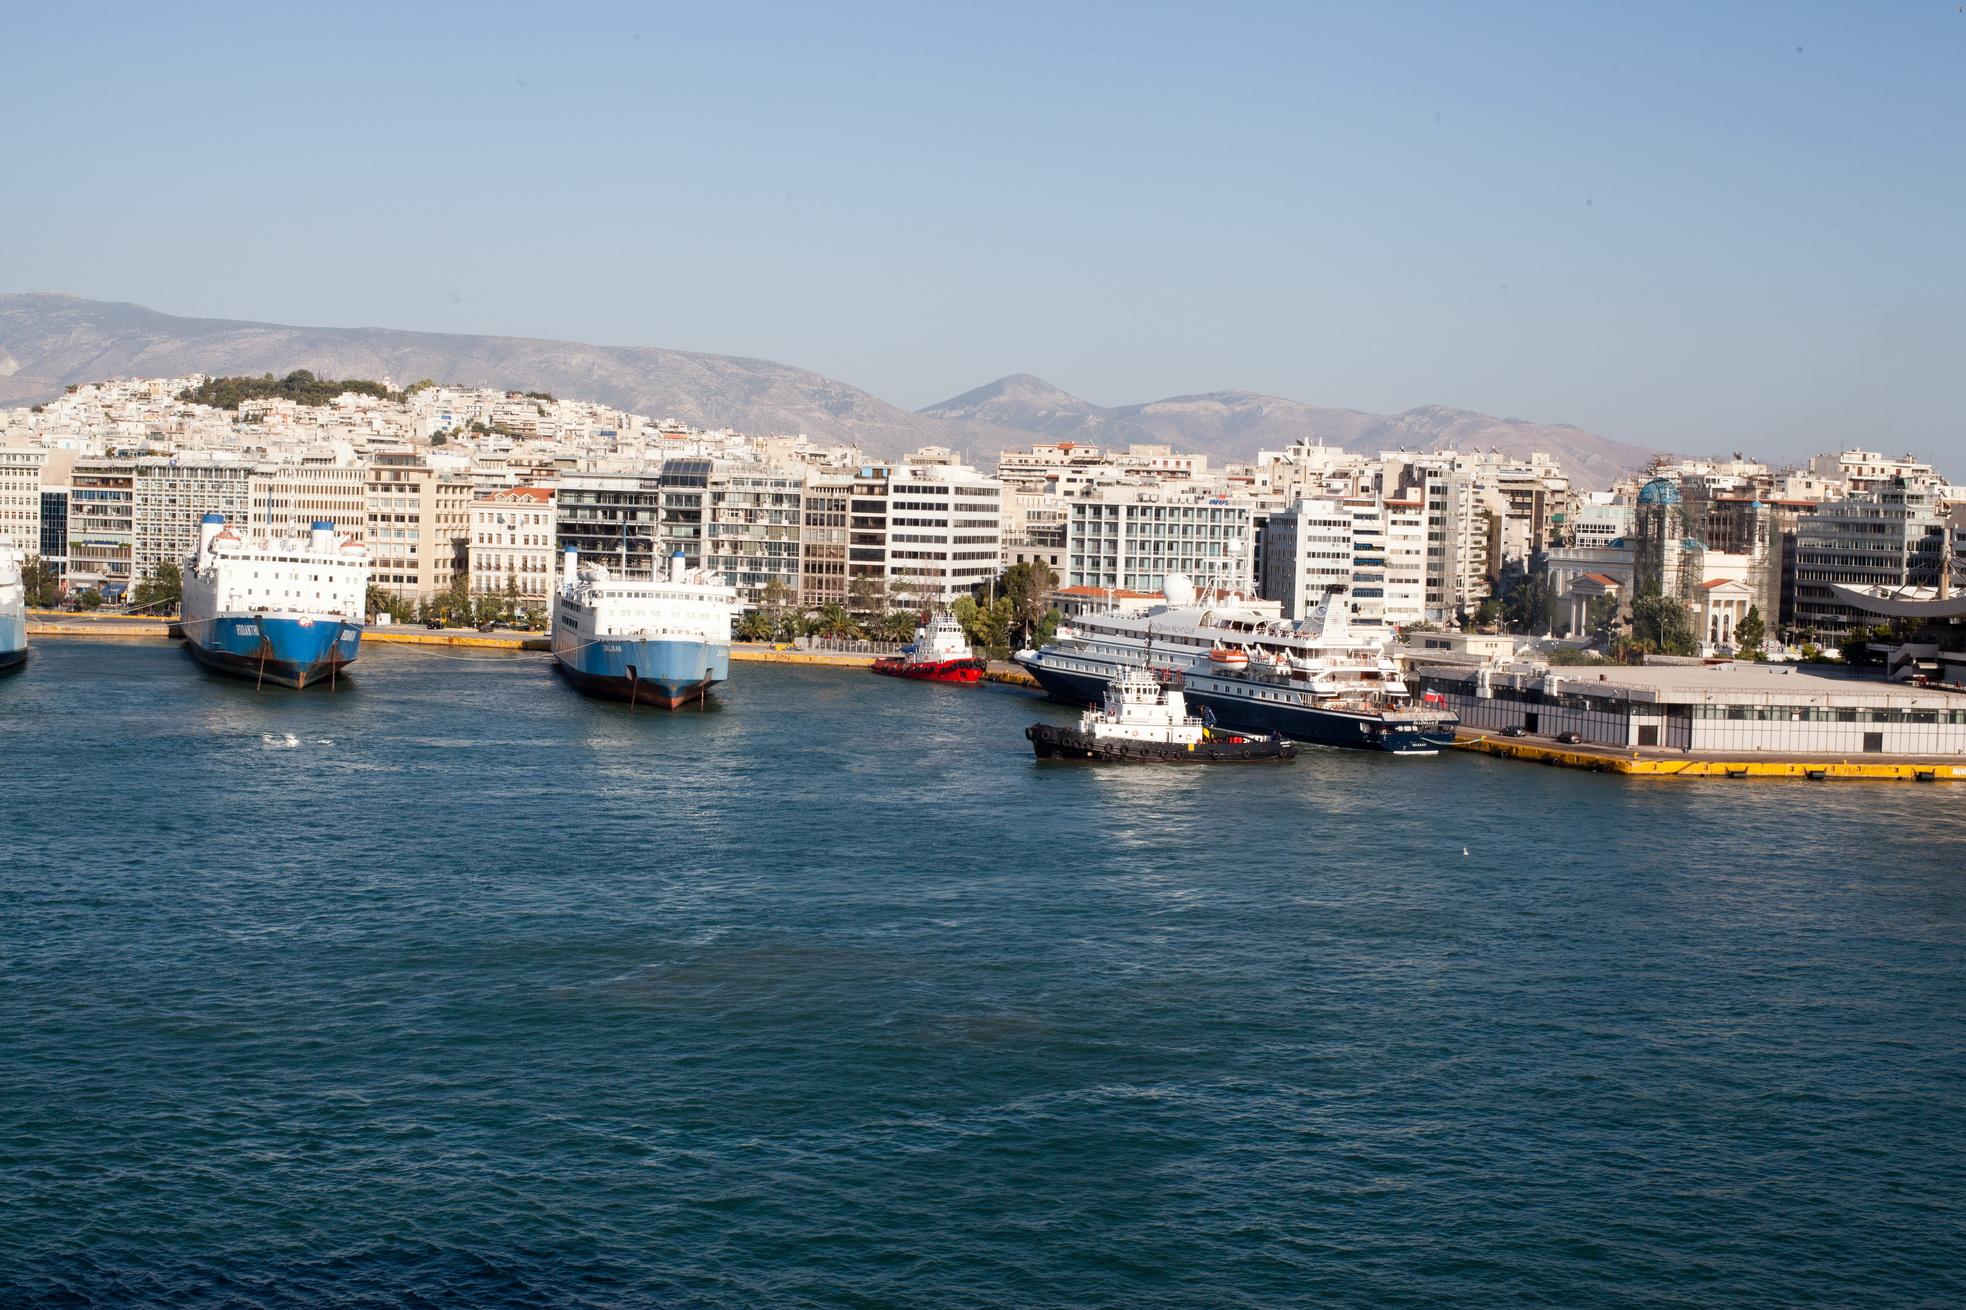 MS Rodanthi and Daliana GA Ferries with Yacht Sea Dream II docked Piraeus Port of Athens Greece 02